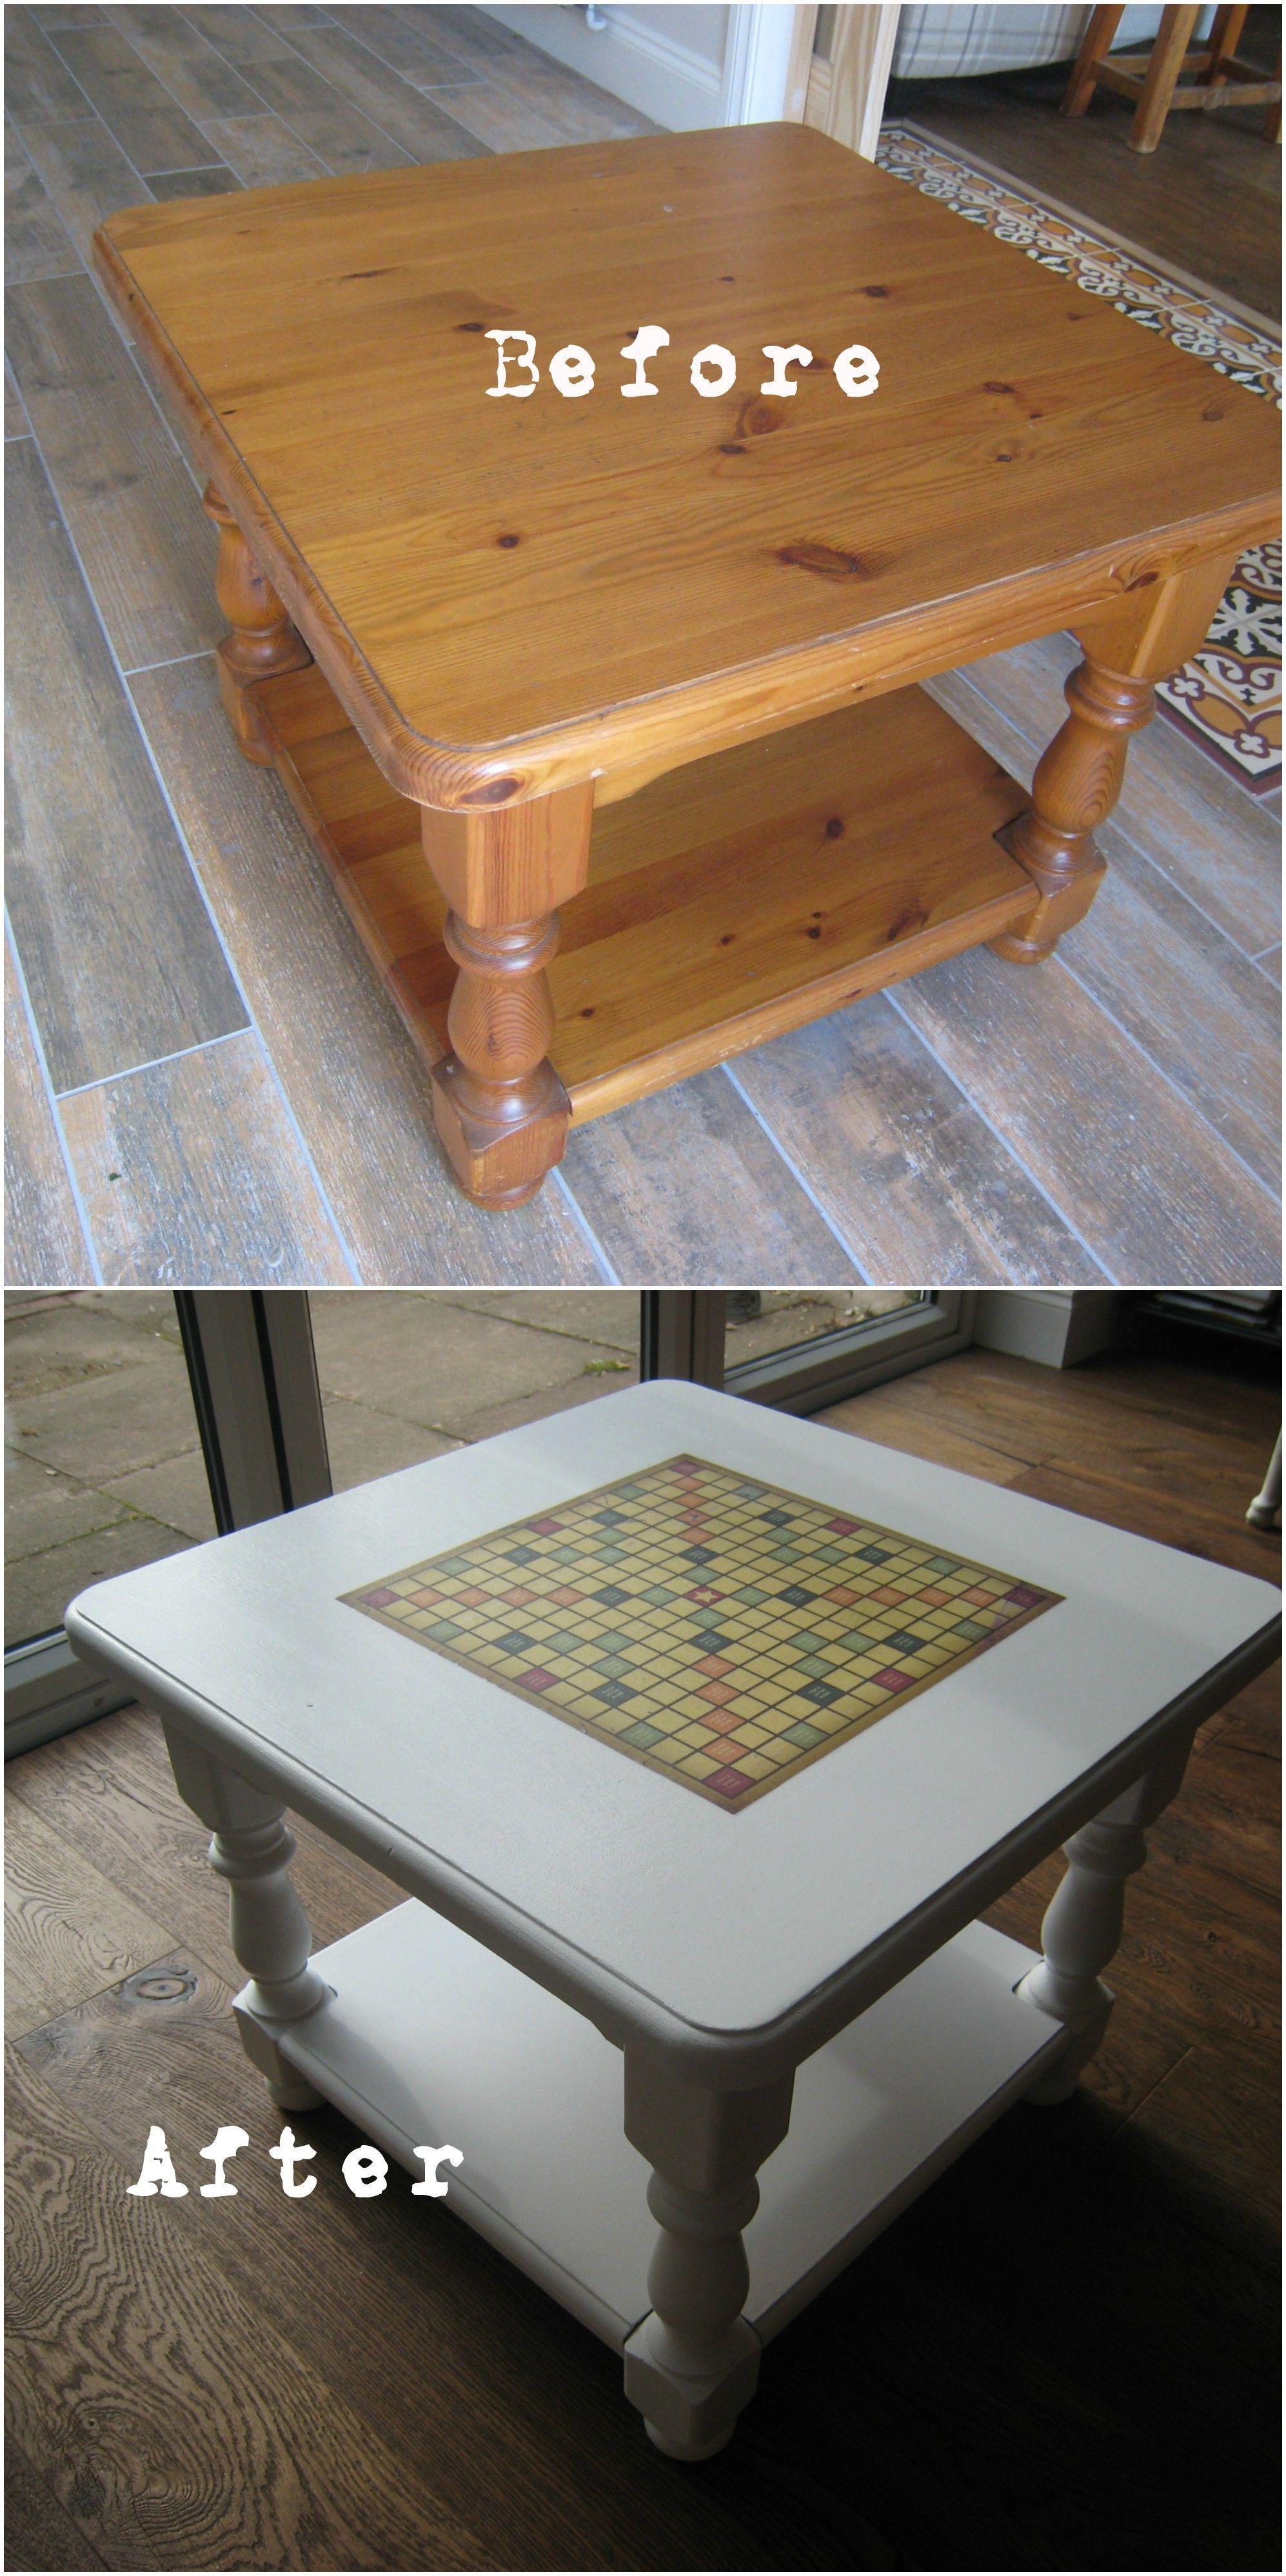 Strange Decoupaging Scrabble Board Onto A Pine Coffee Table Amazing Uwap Interior Chair Design Uwaporg